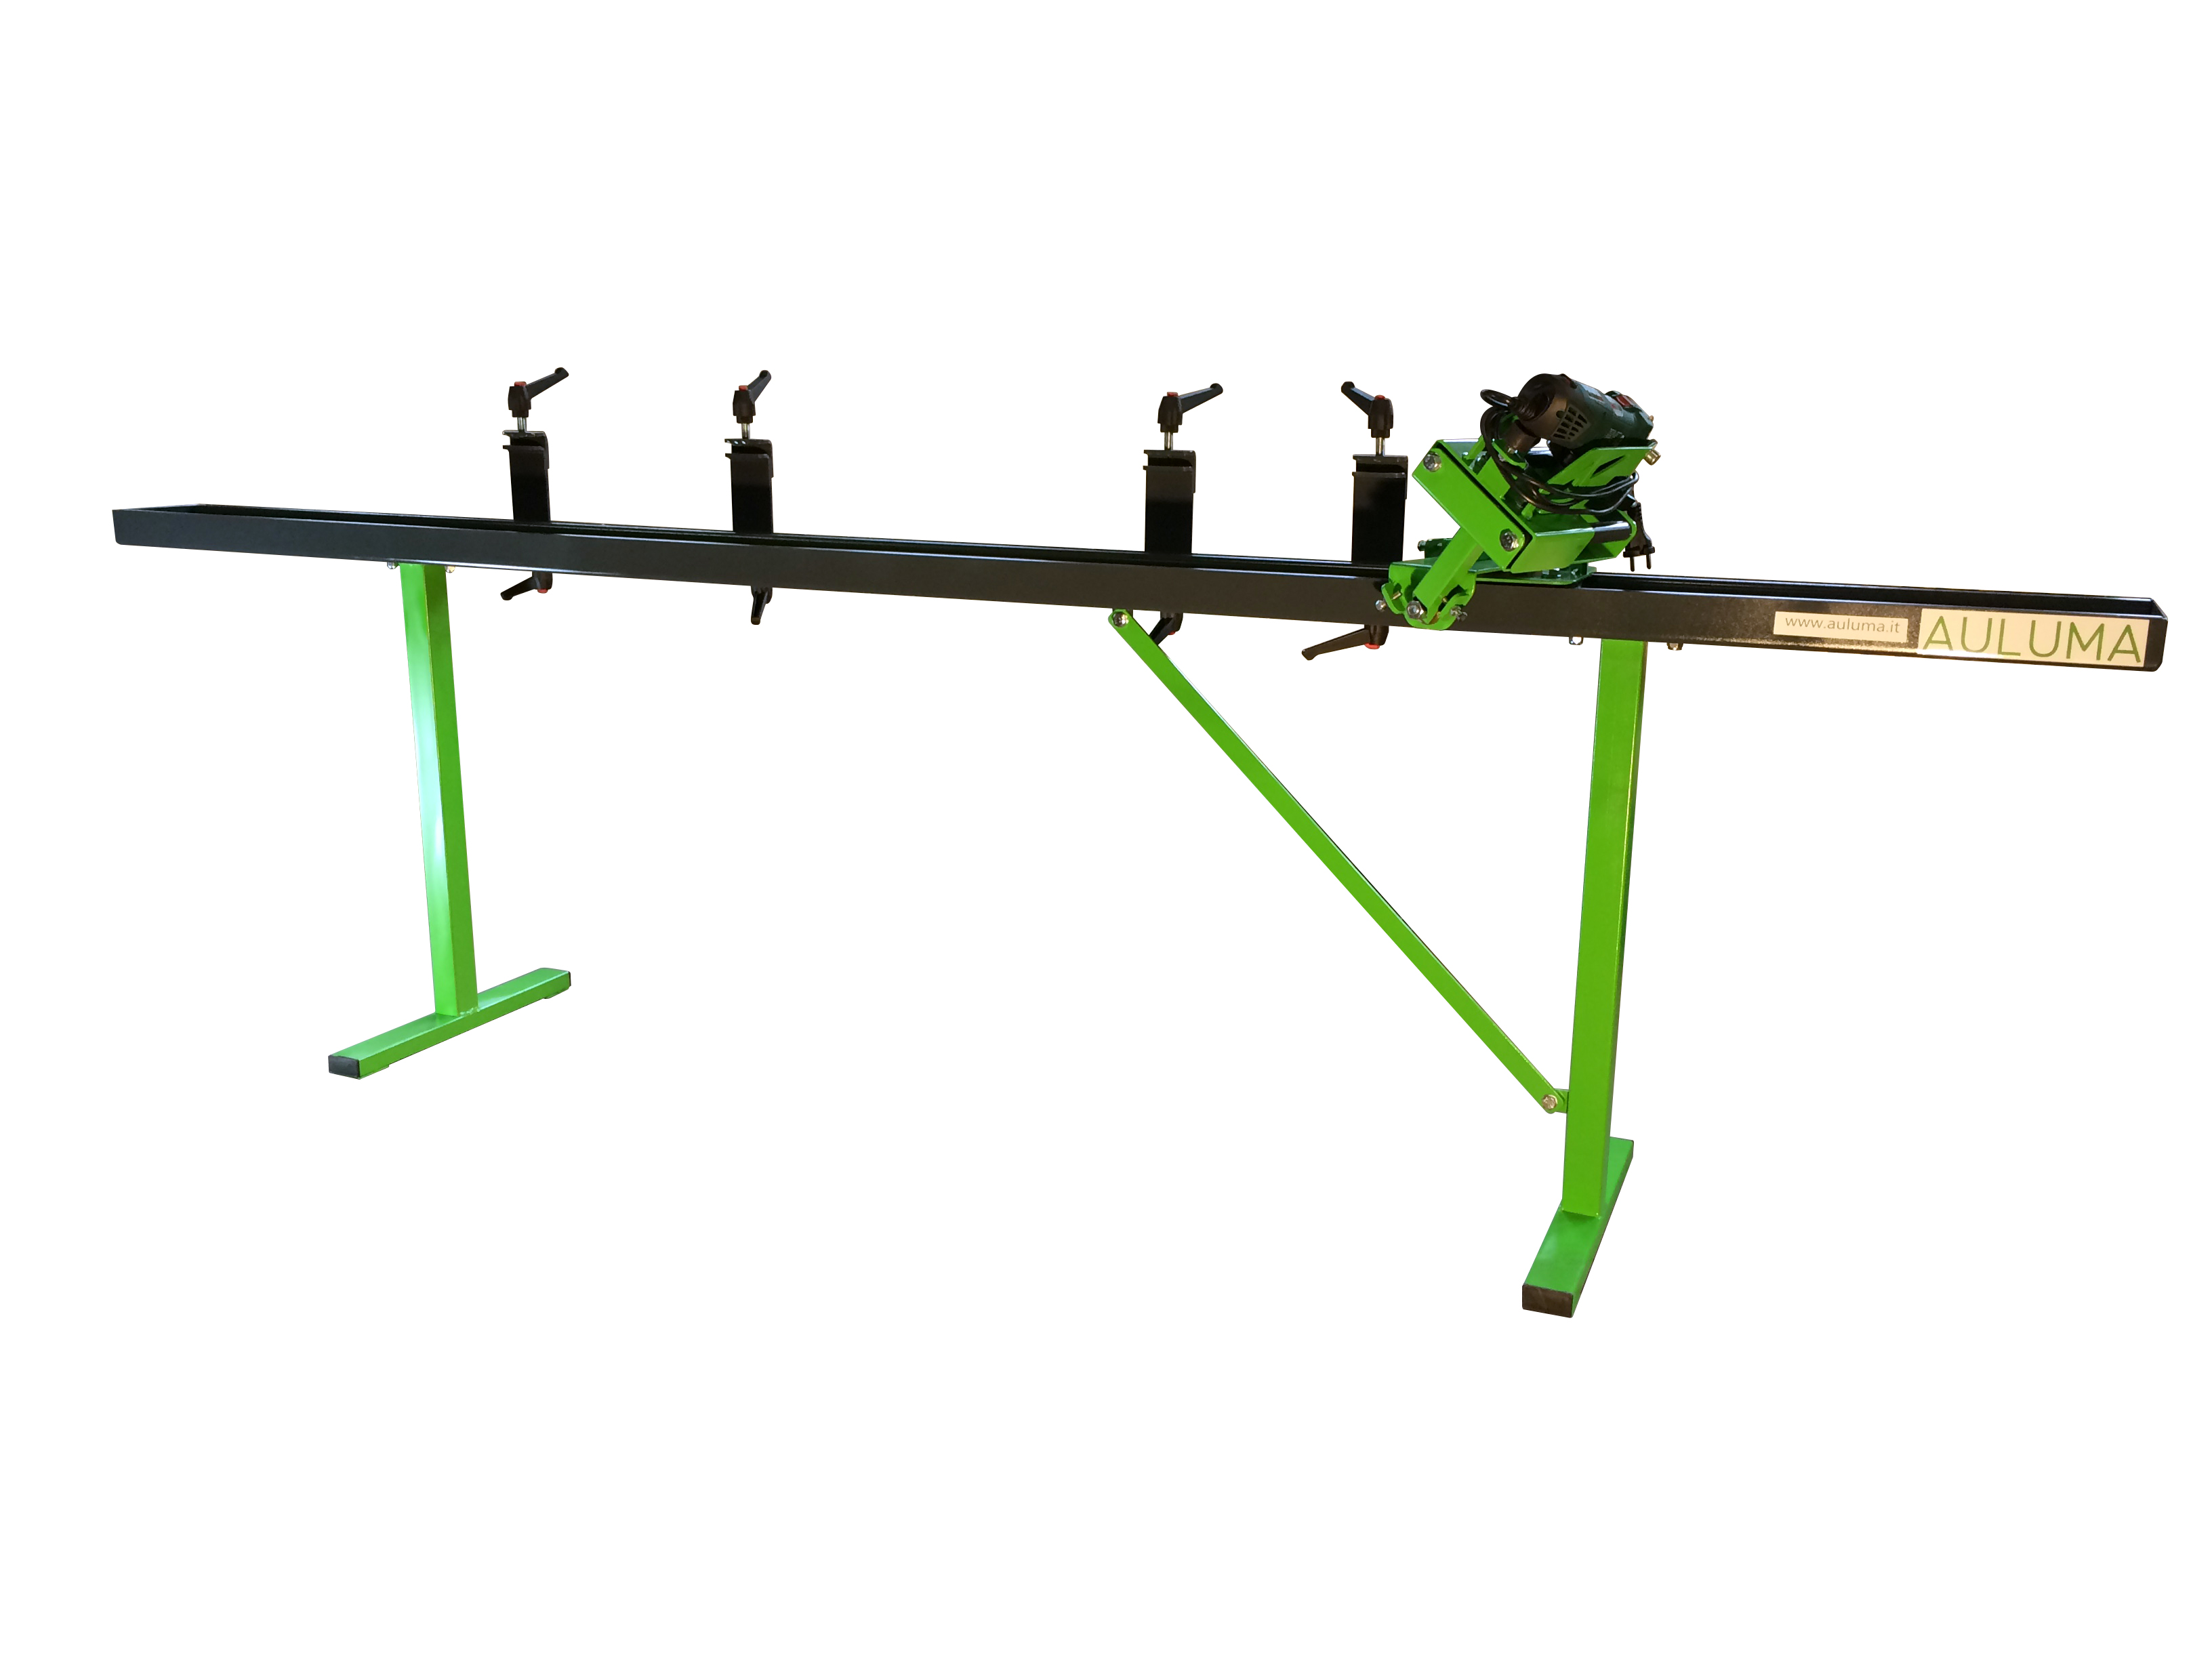 schleifger t f r doppelmesser auluma engineering passion metallbau in s dtirol alto adige. Black Bedroom Furniture Sets. Home Design Ideas